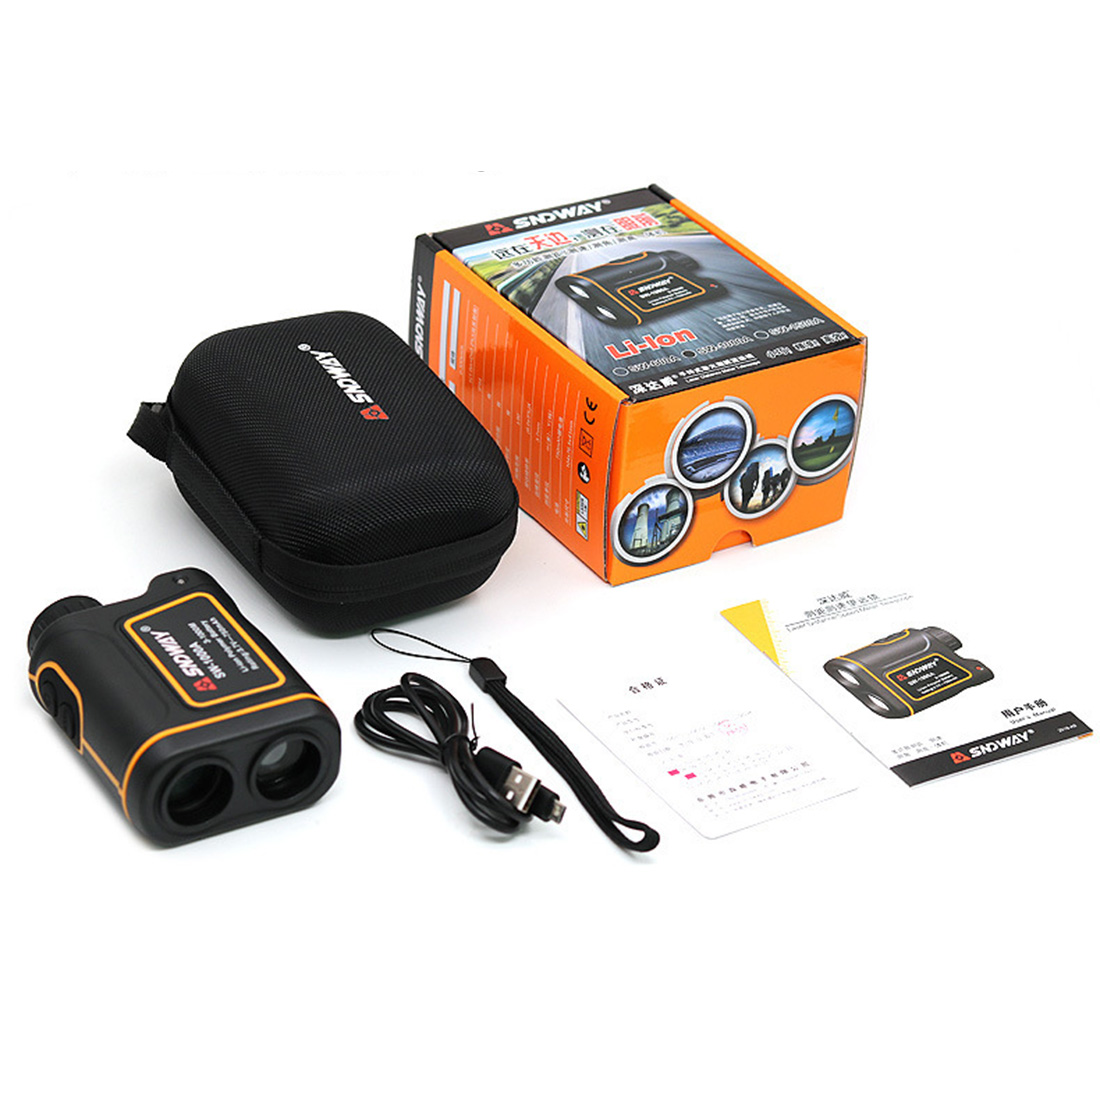 7X Measurement Range Finder Hunting Golf Rangefinder Speed Scanning Model - IP54 Waterproof (1500m/1000m/600m)